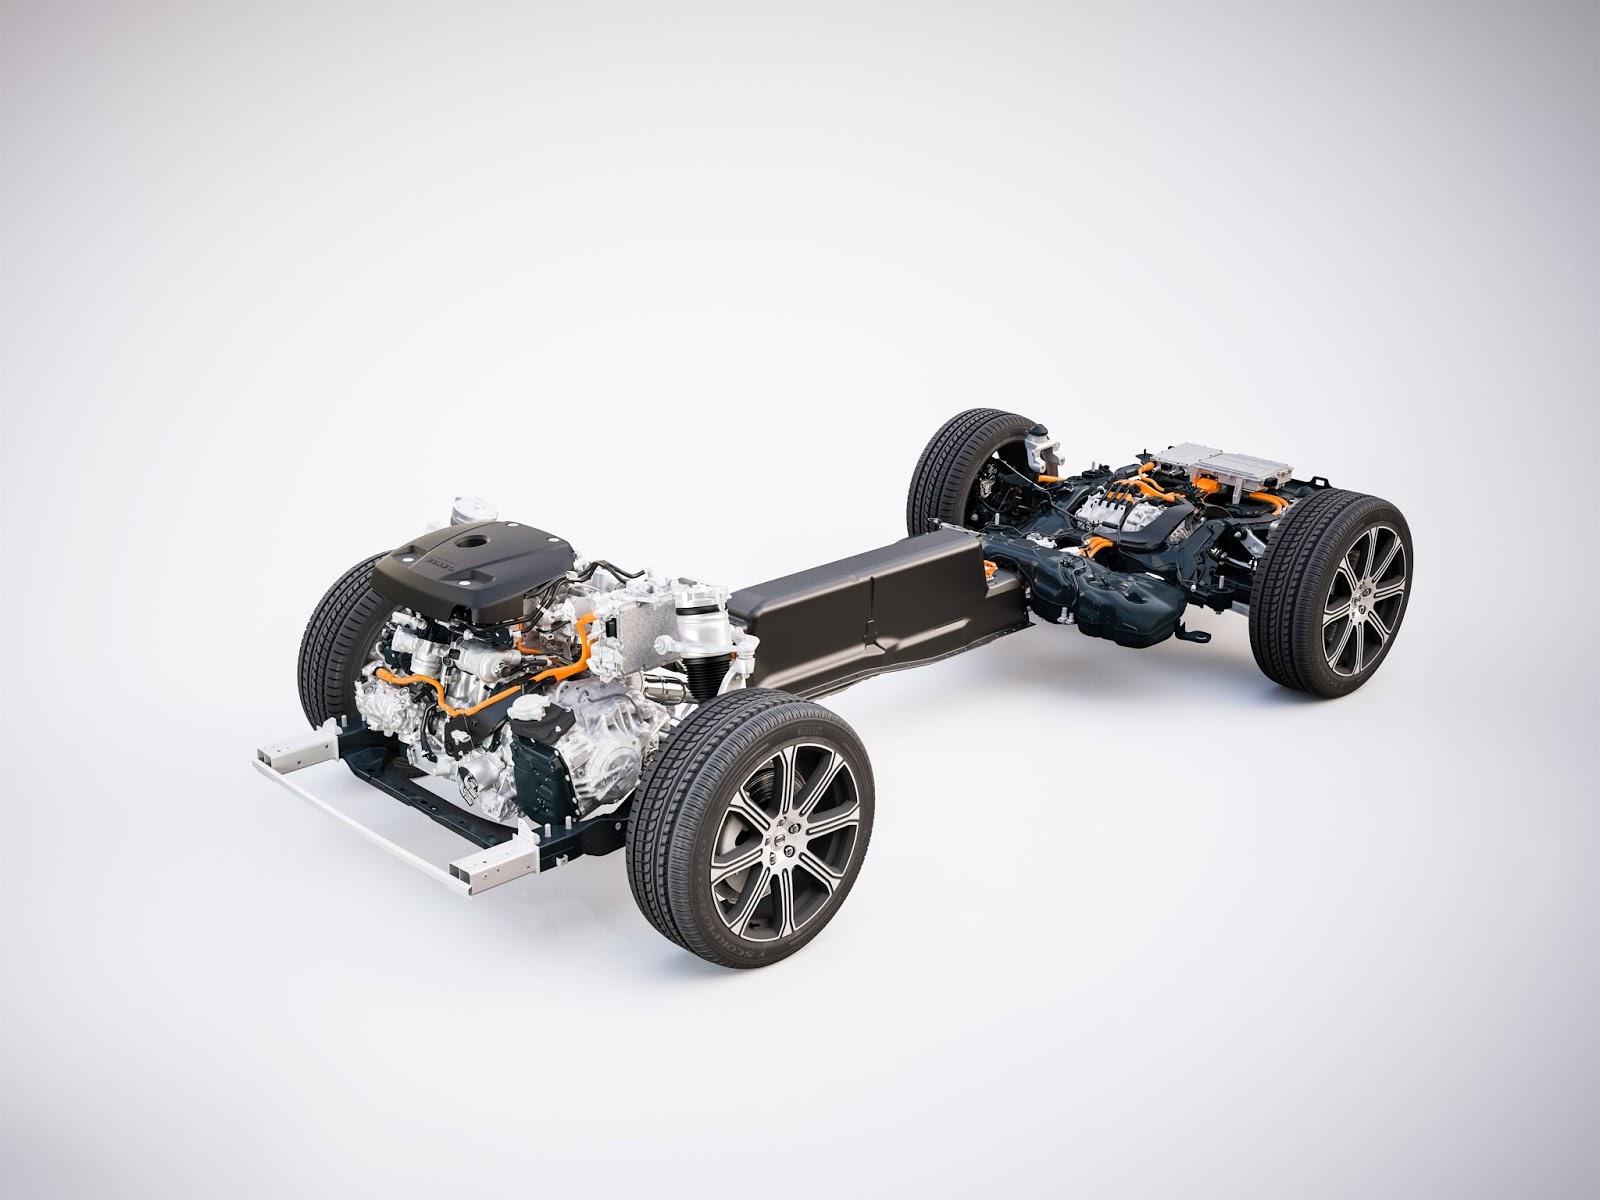 The%2Bnew%2BVolvo%2BXC60%2BT8%2Bpowertrain Είναι αυτό το ασφαλέστερο αυτοκίνητο ever; Volvo, Volvo XC60, zblog